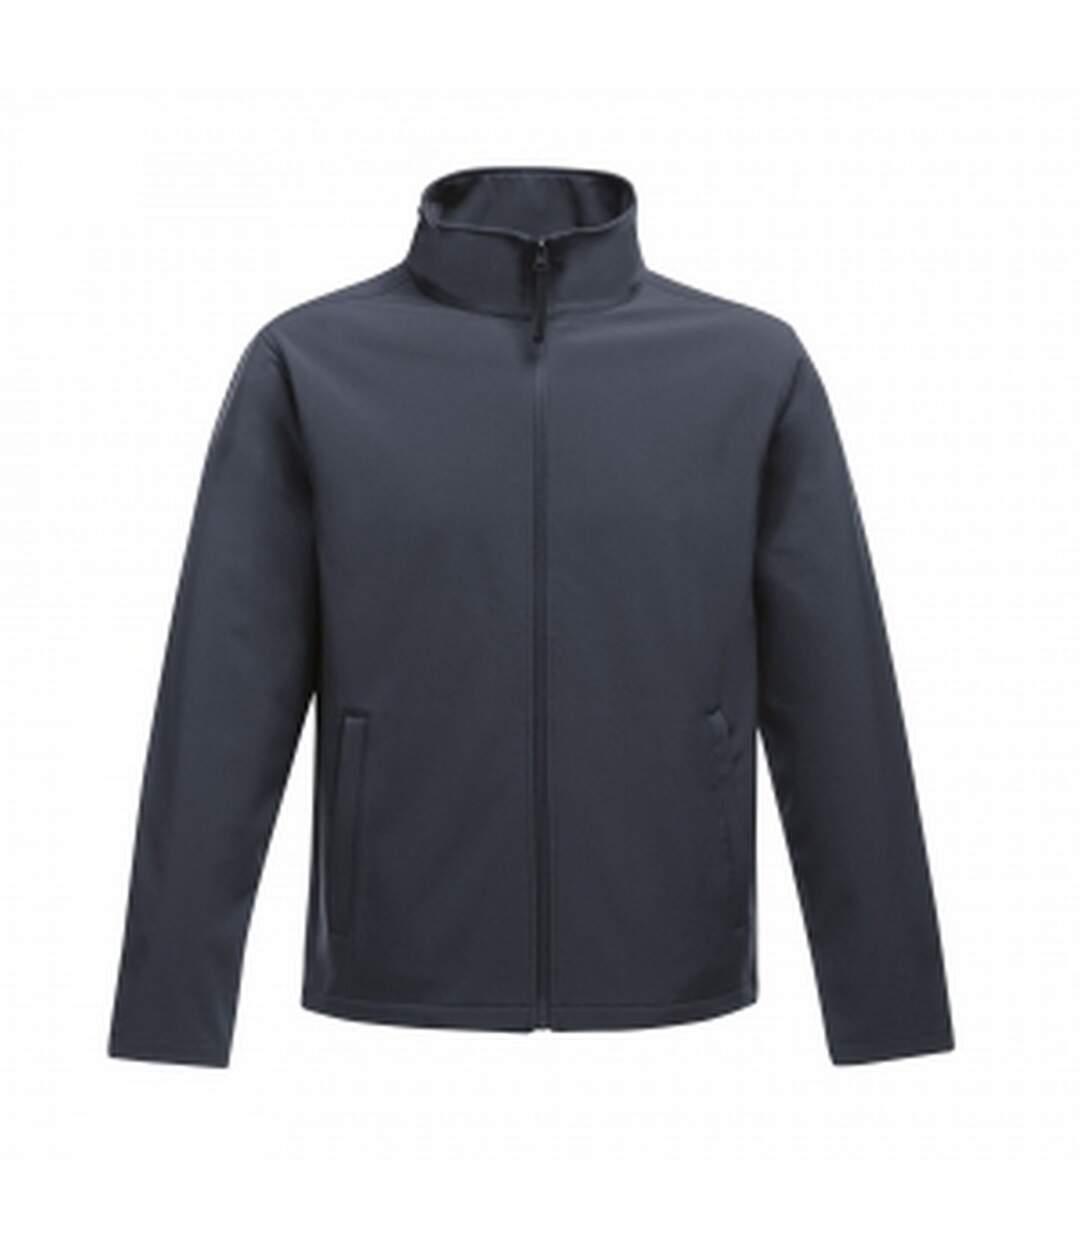 Regatta Mens Ablaze Printable Softshell Jacket (Navy/Navy) - UTRG3560